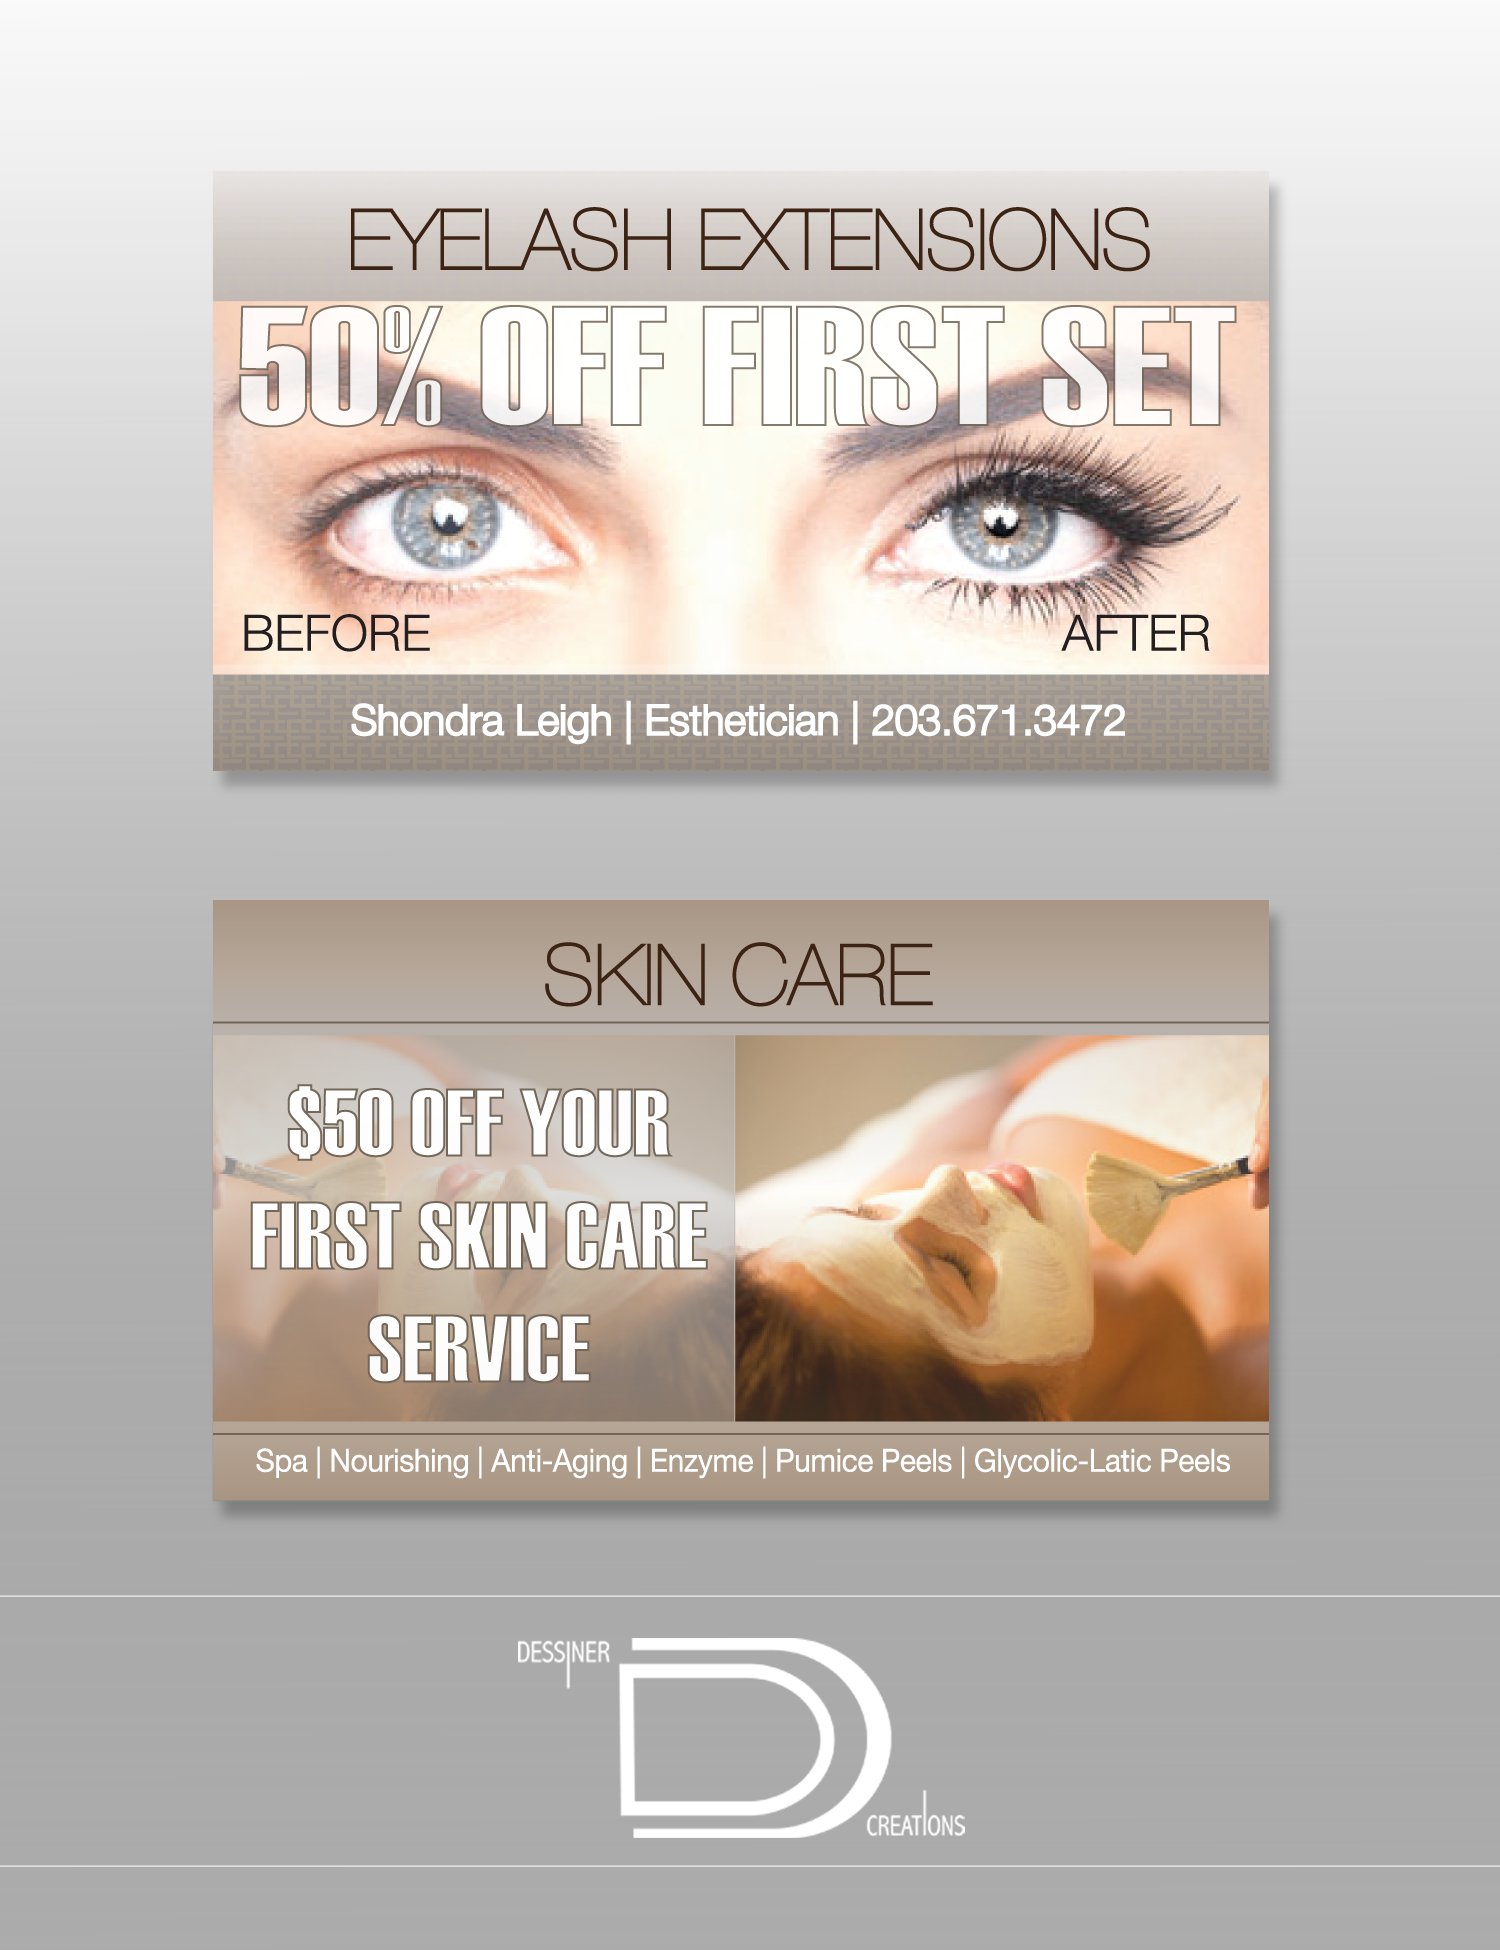 Eyelash Ext Business Card v2 by just is on DeviantArt